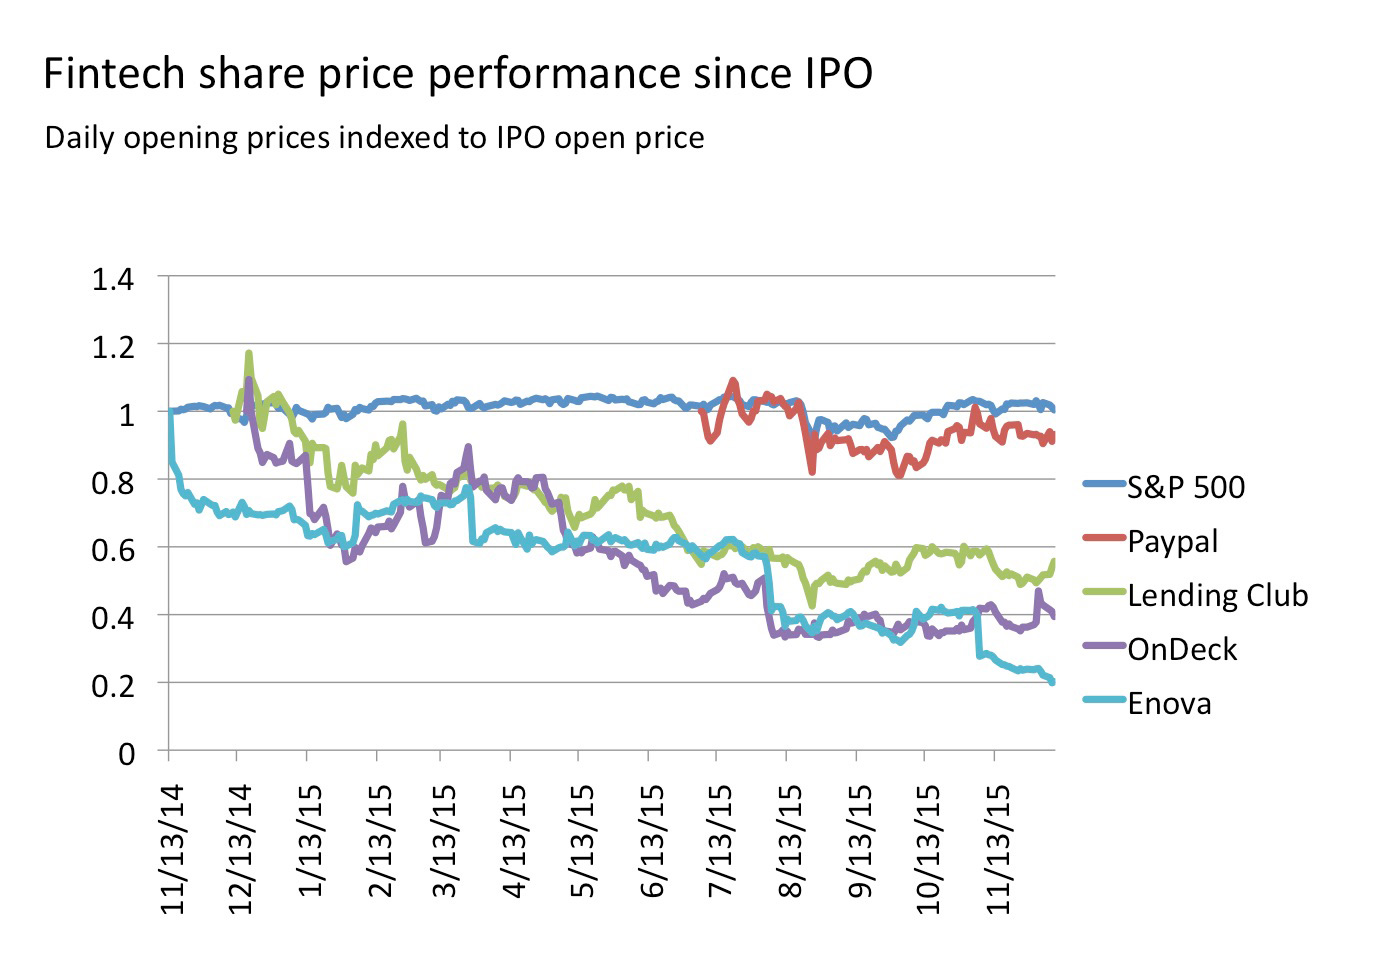 Fintech share price